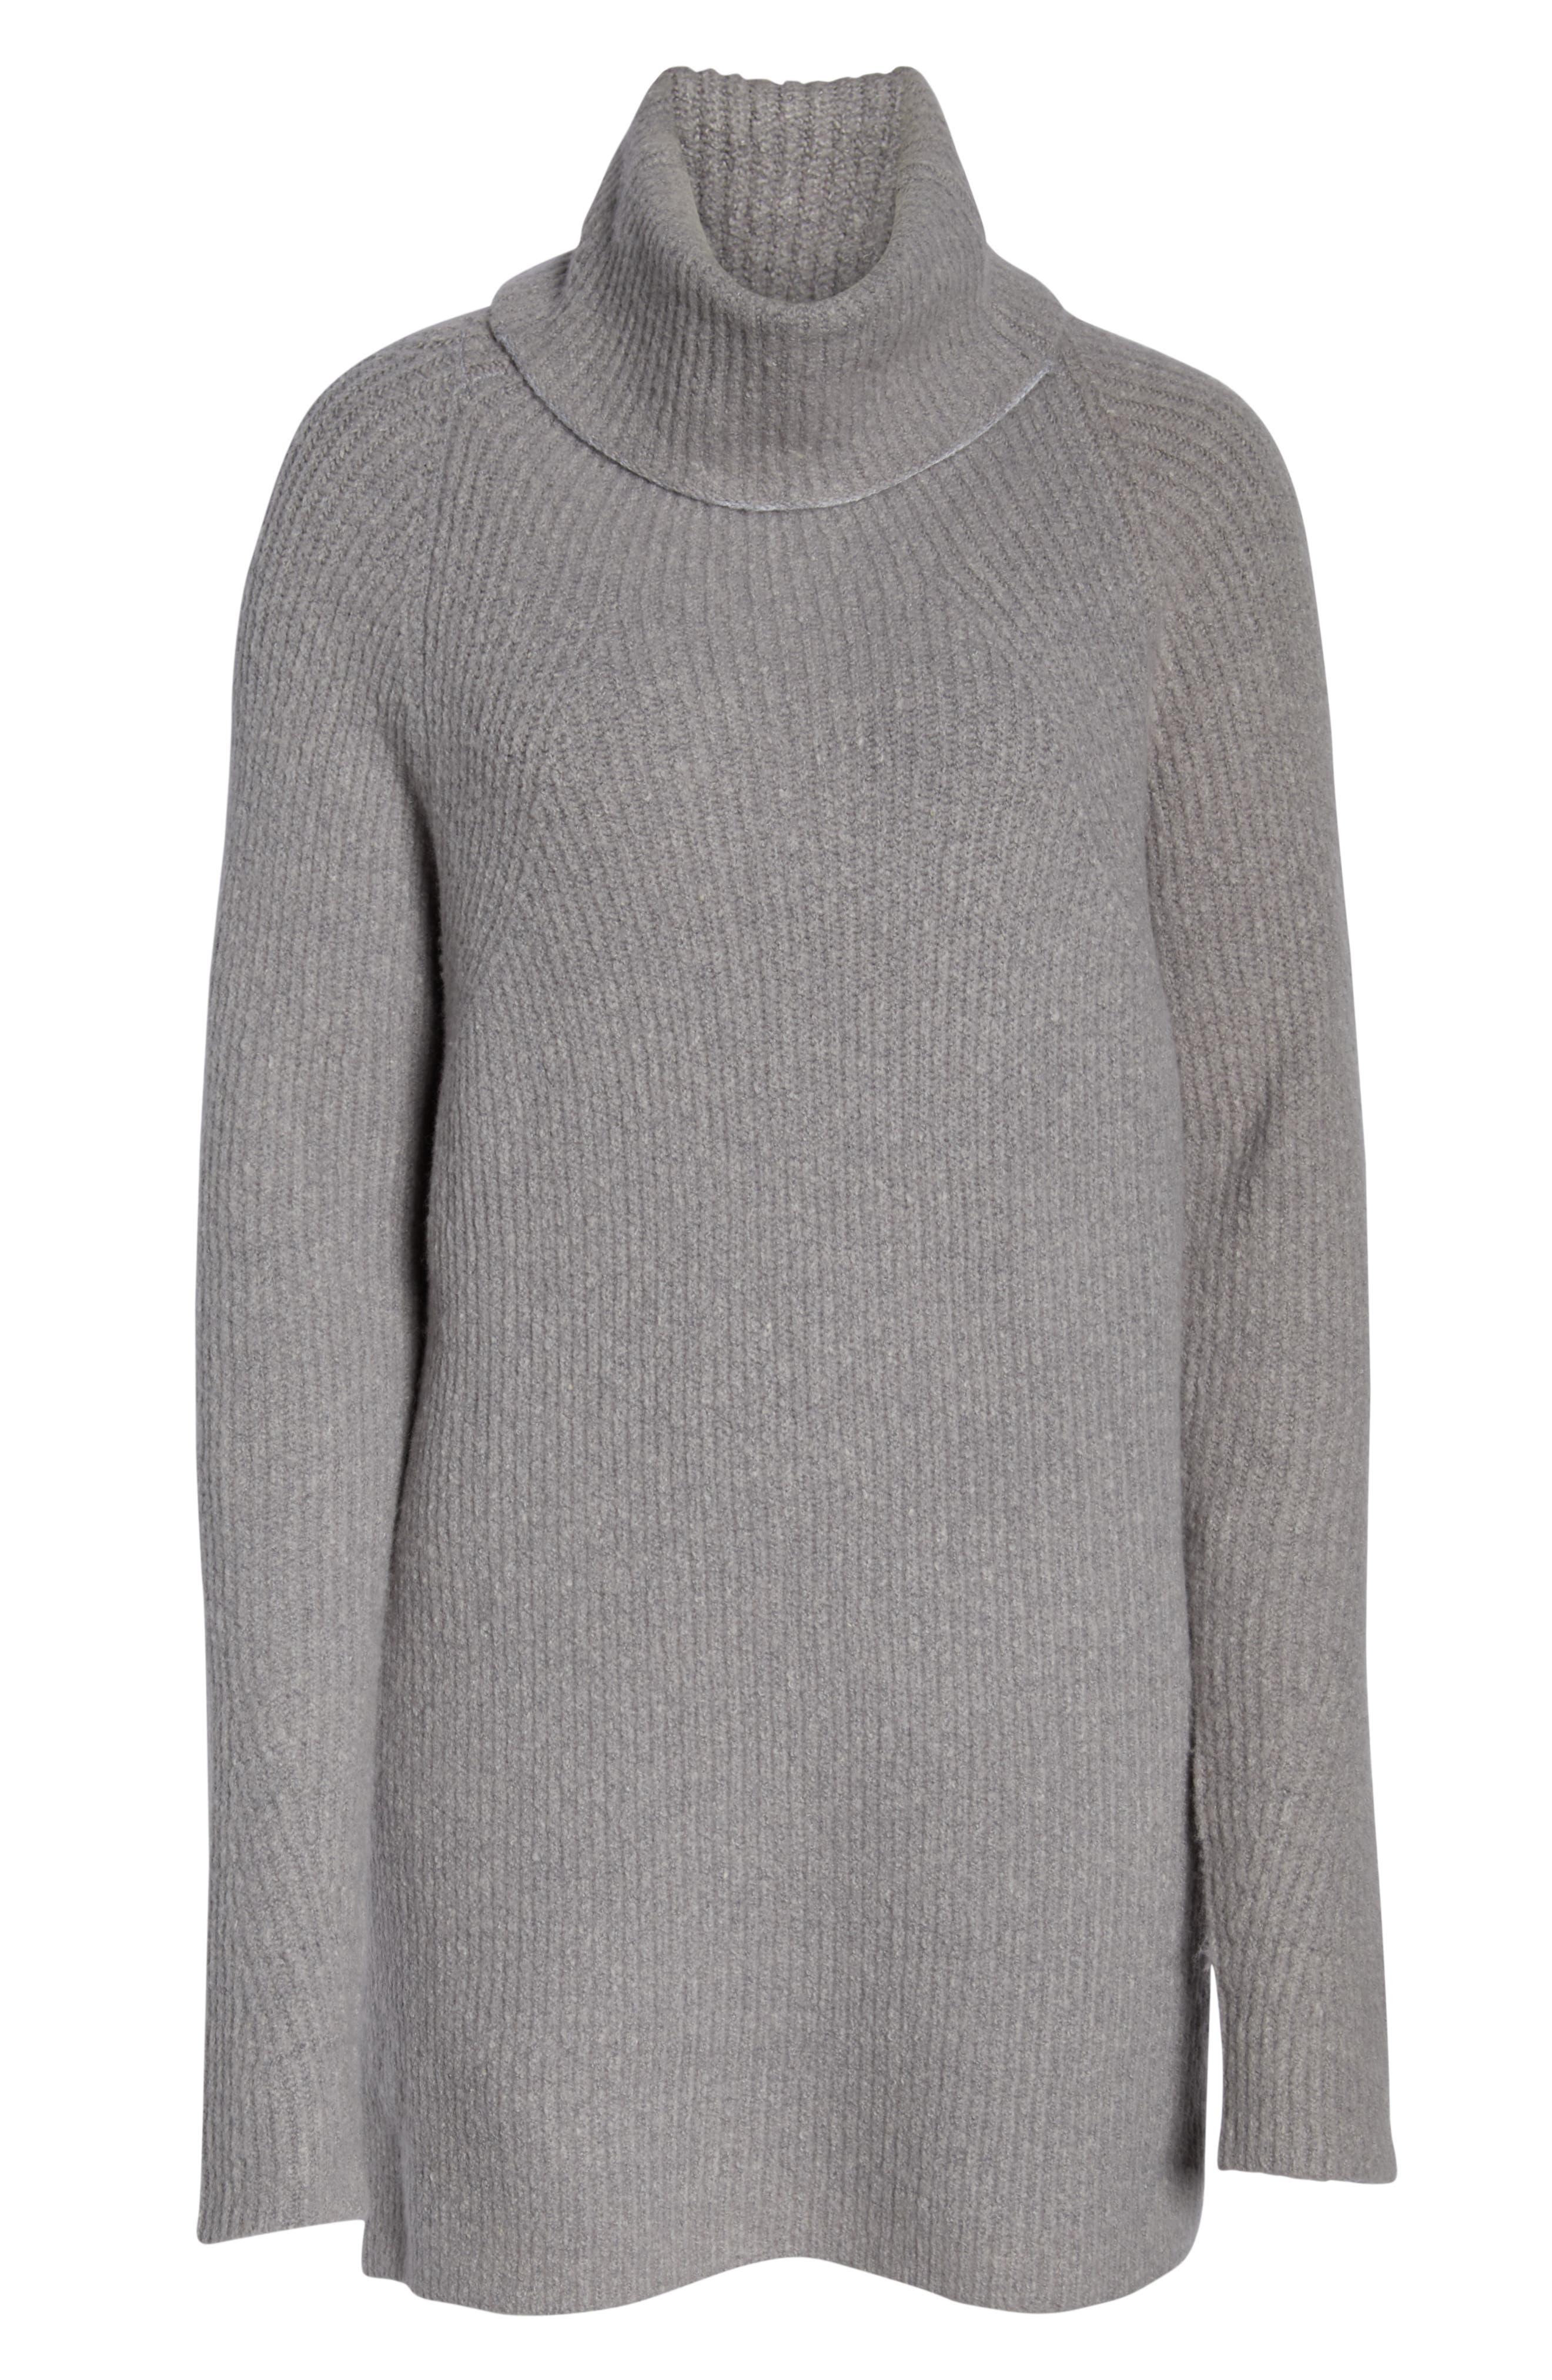 SWEATY BETTY,                             Shakti Oversize Sweater,                             Alternate thumbnail 7, color,                             023